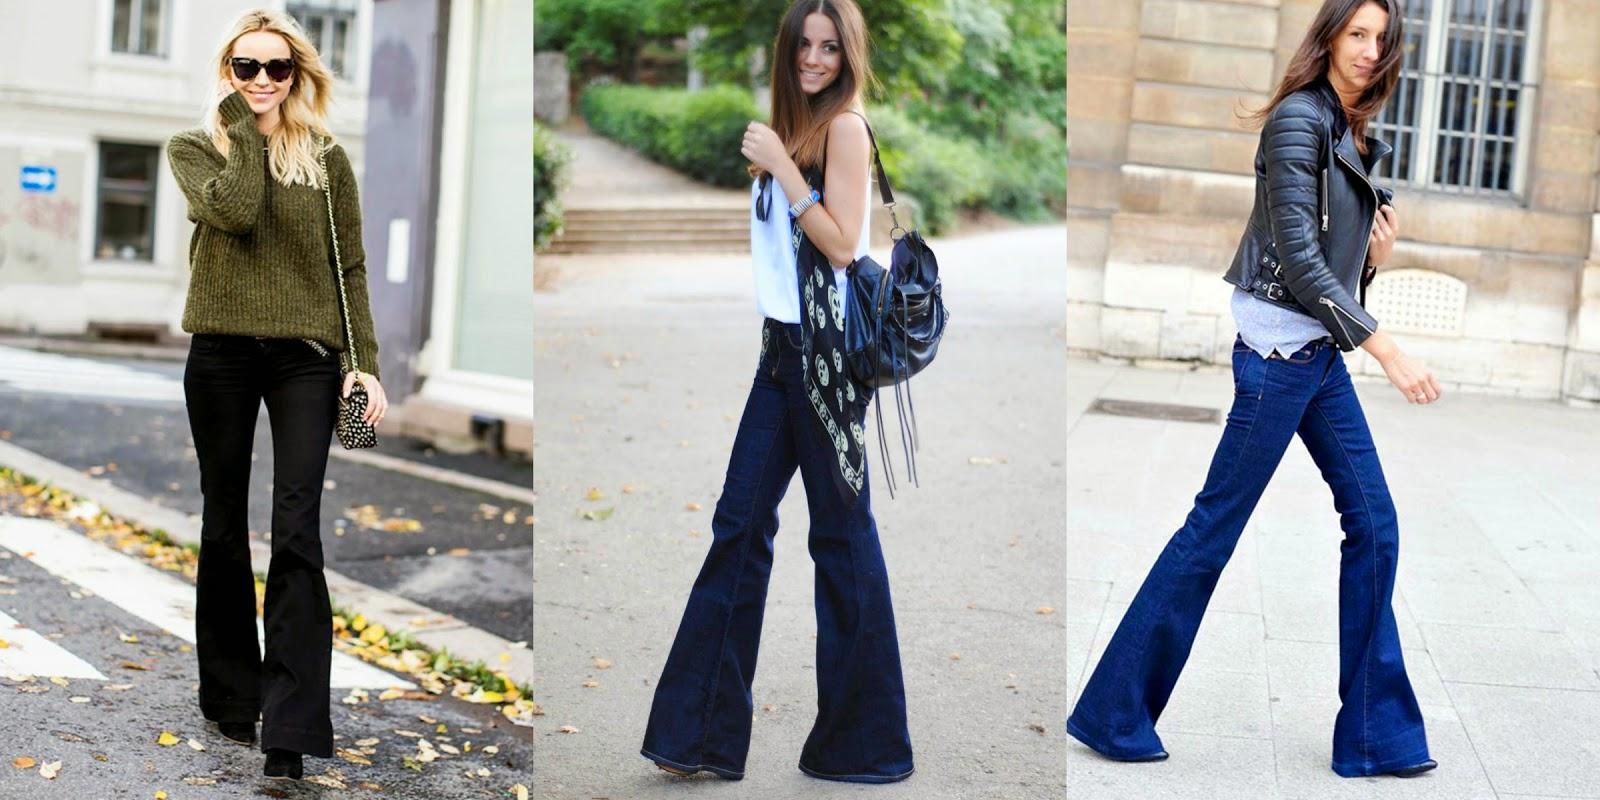 l'ultimo 6badd c3efe Sai abbinare i jeans a zampa? [TEST] | Pourfemme